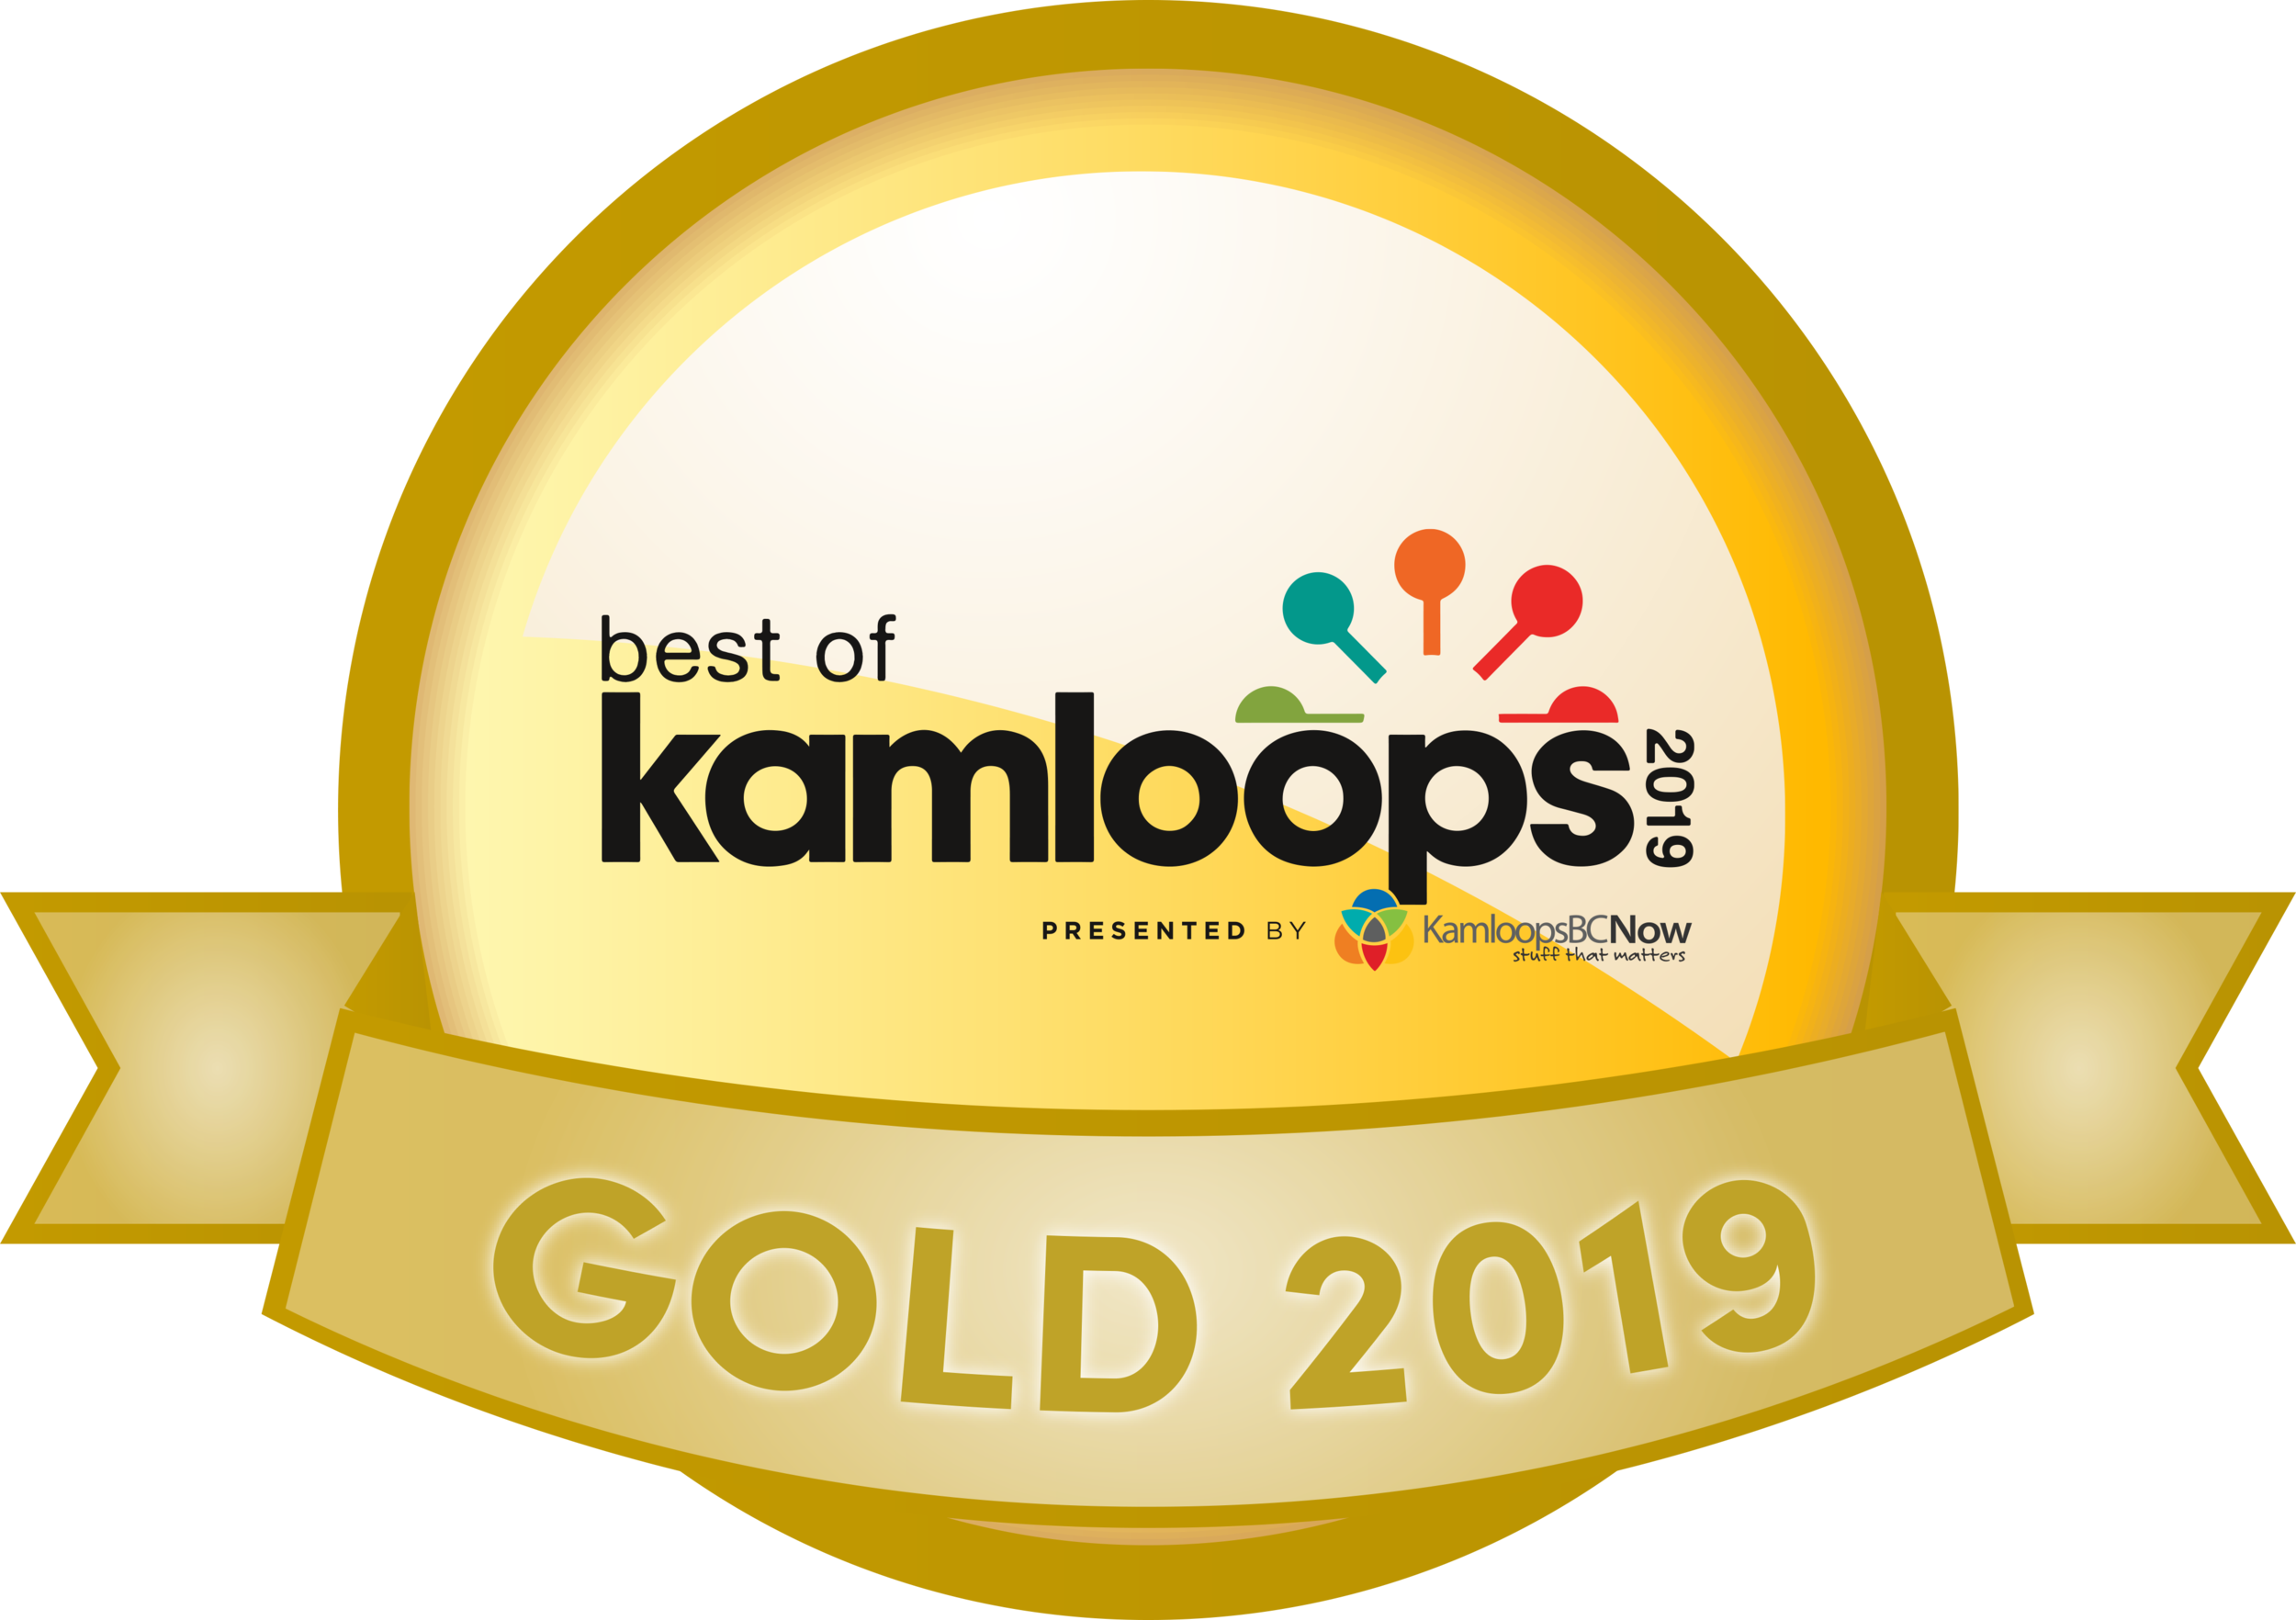 BestofKamloops2019_GoldBadge.png